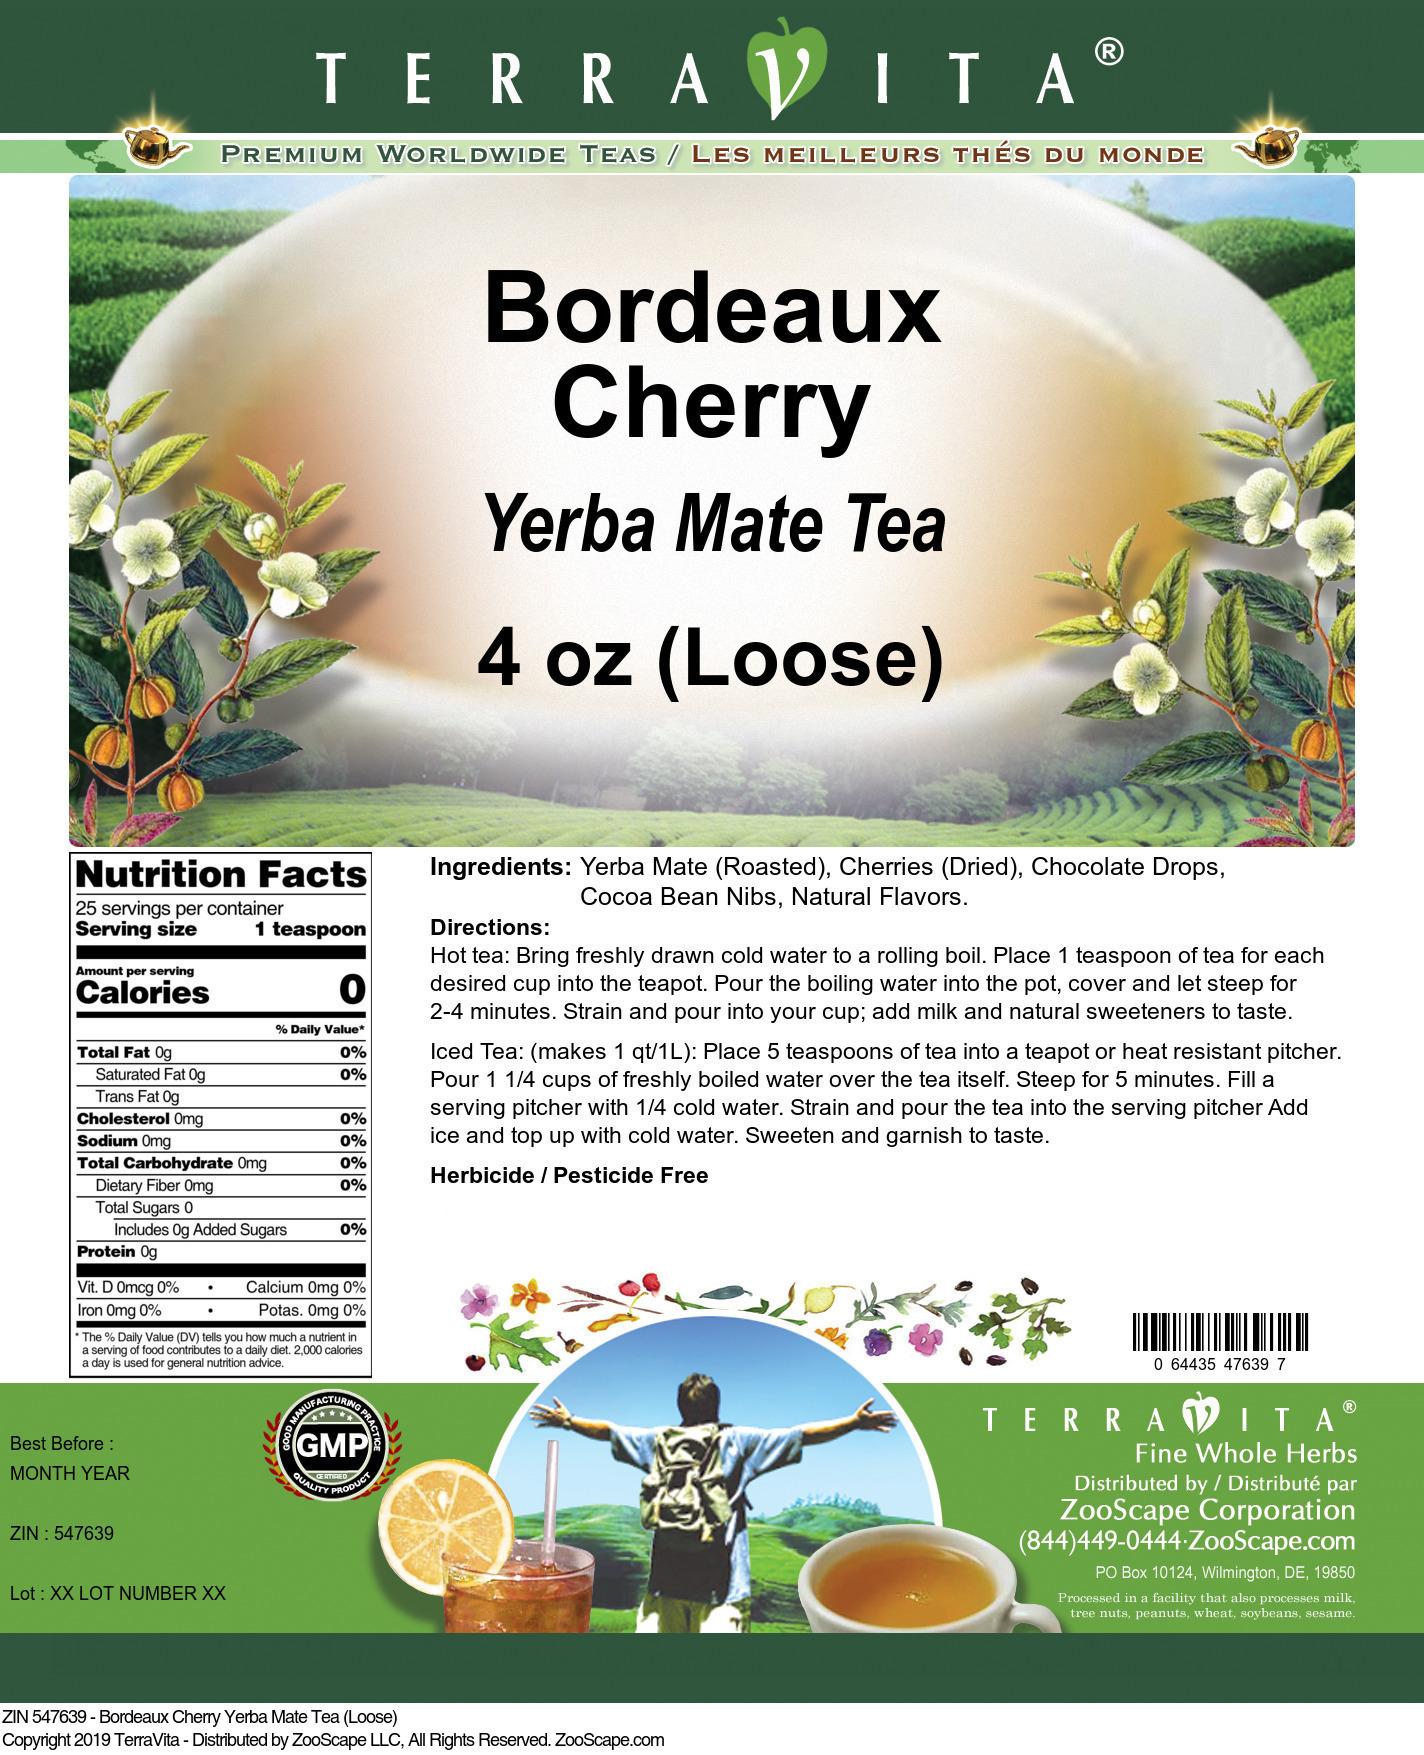 Bordeaux Cherry Yerba Mate